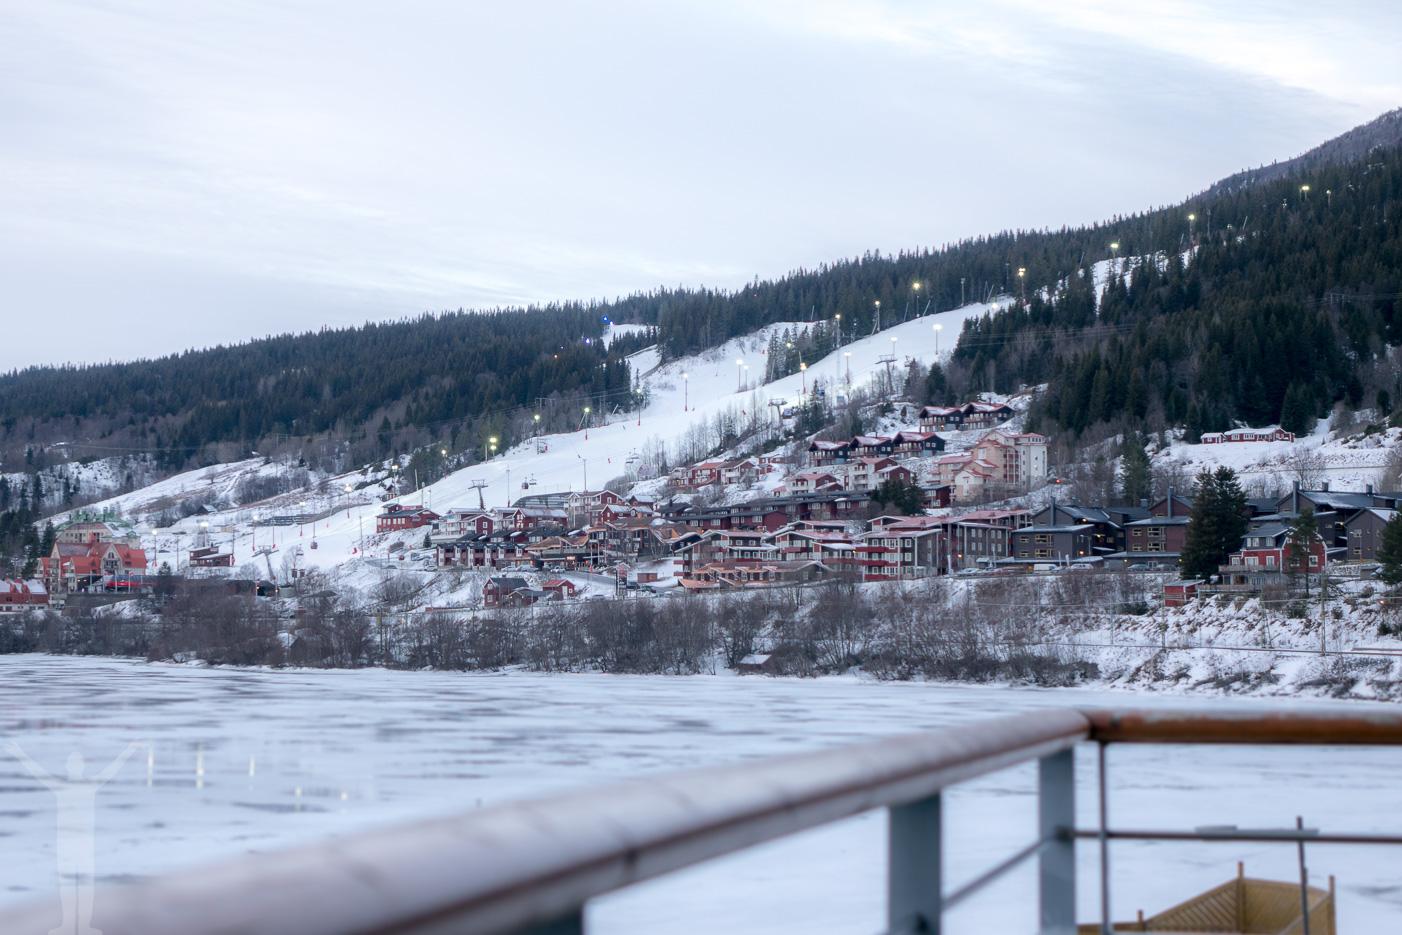 Morgonvyerna över Åre